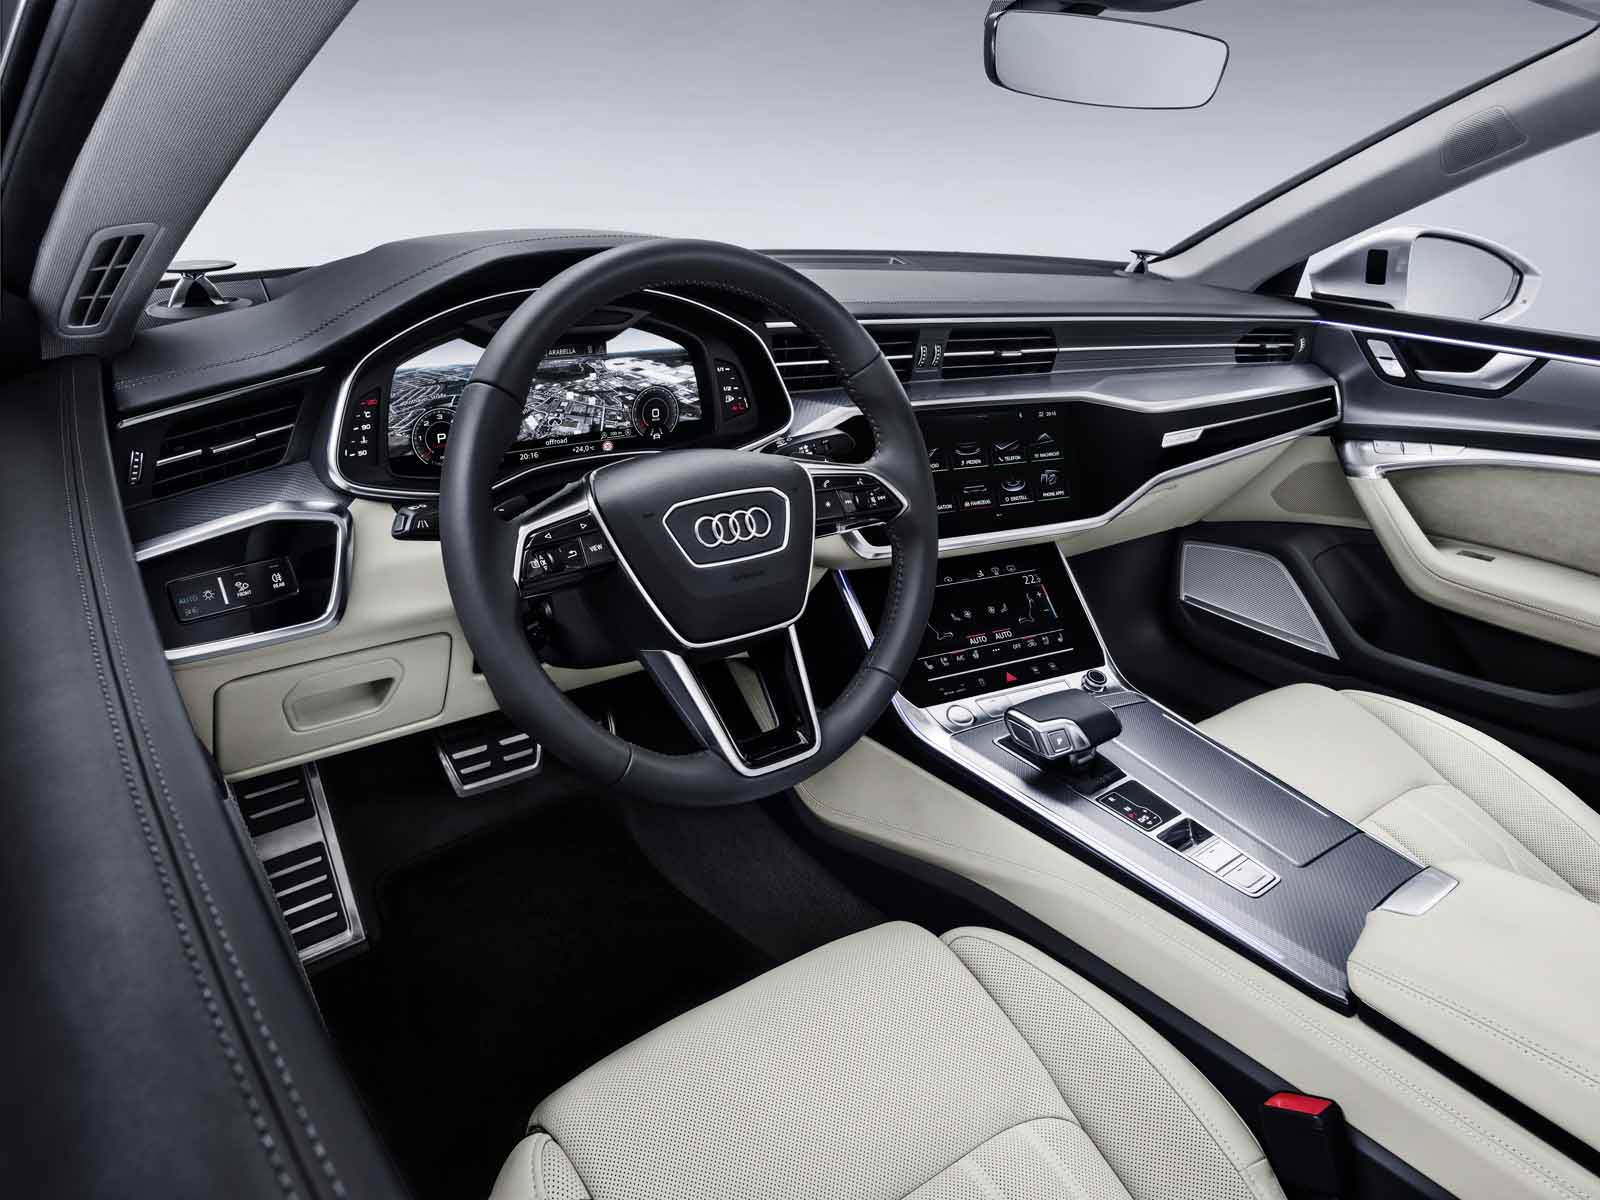 Audi S7 13 600x300 photo